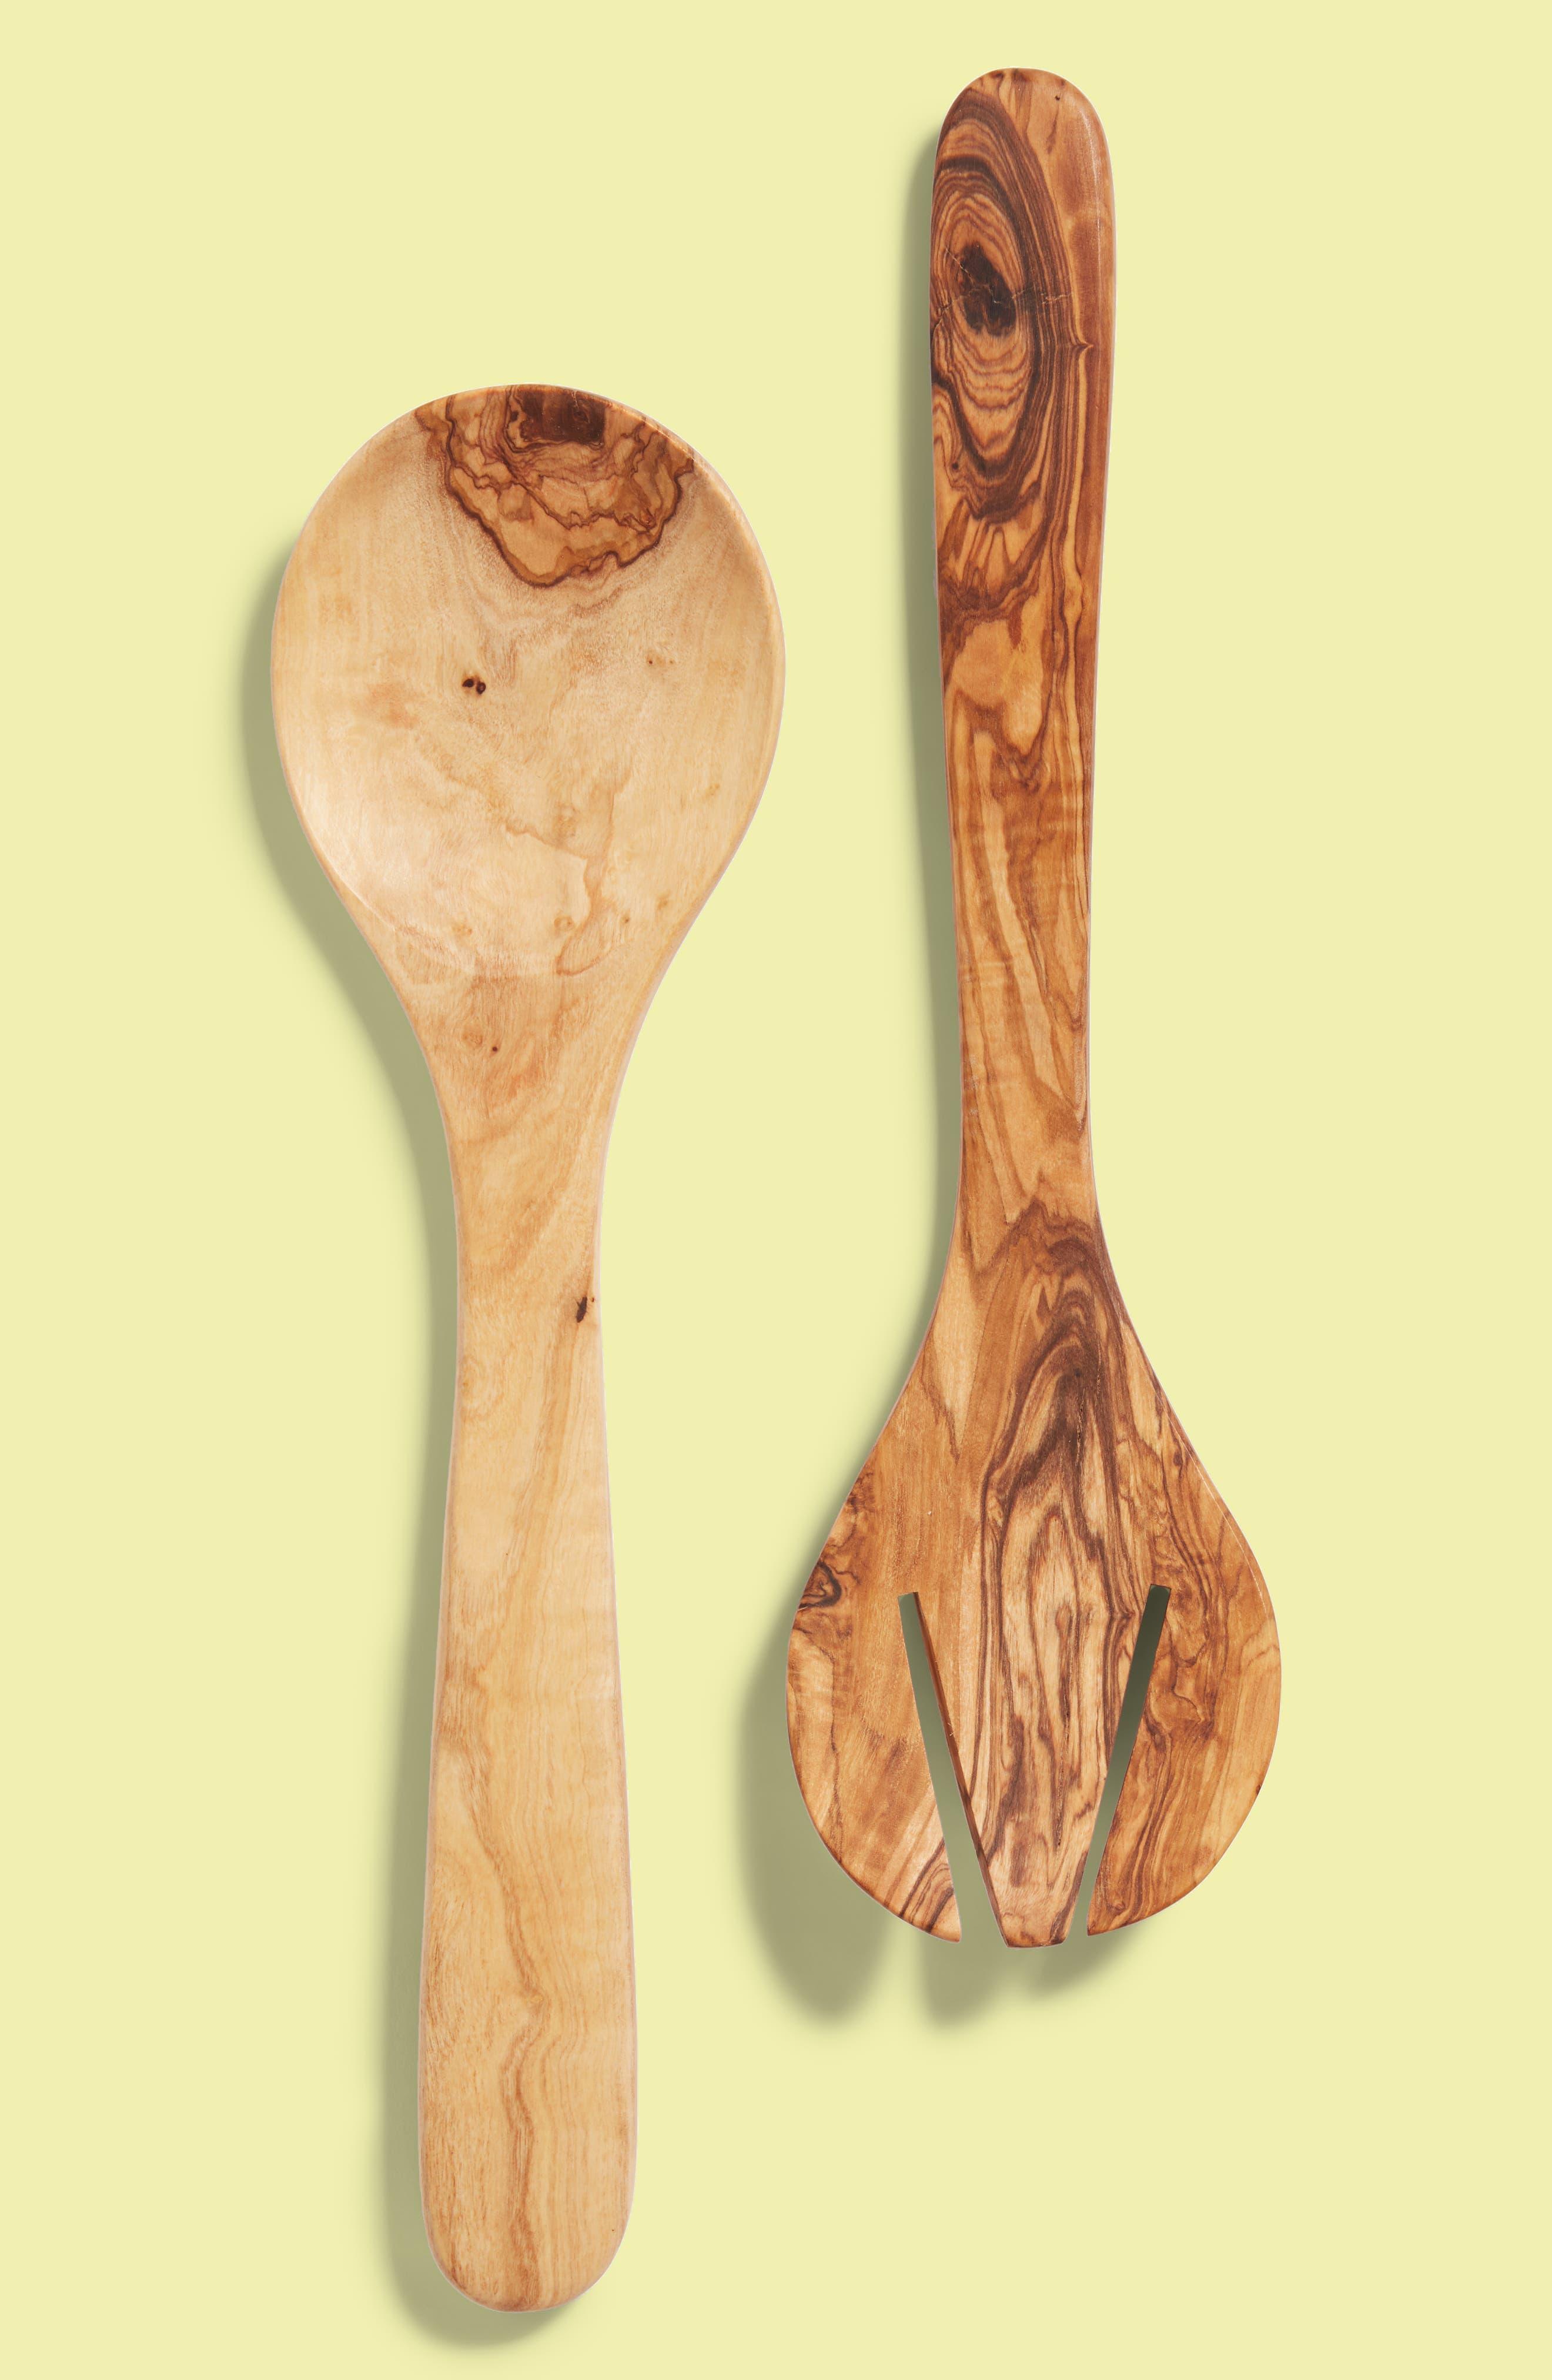 2-Piece Olive Wood Round Serving Set,                             Main thumbnail 1, color,                             200